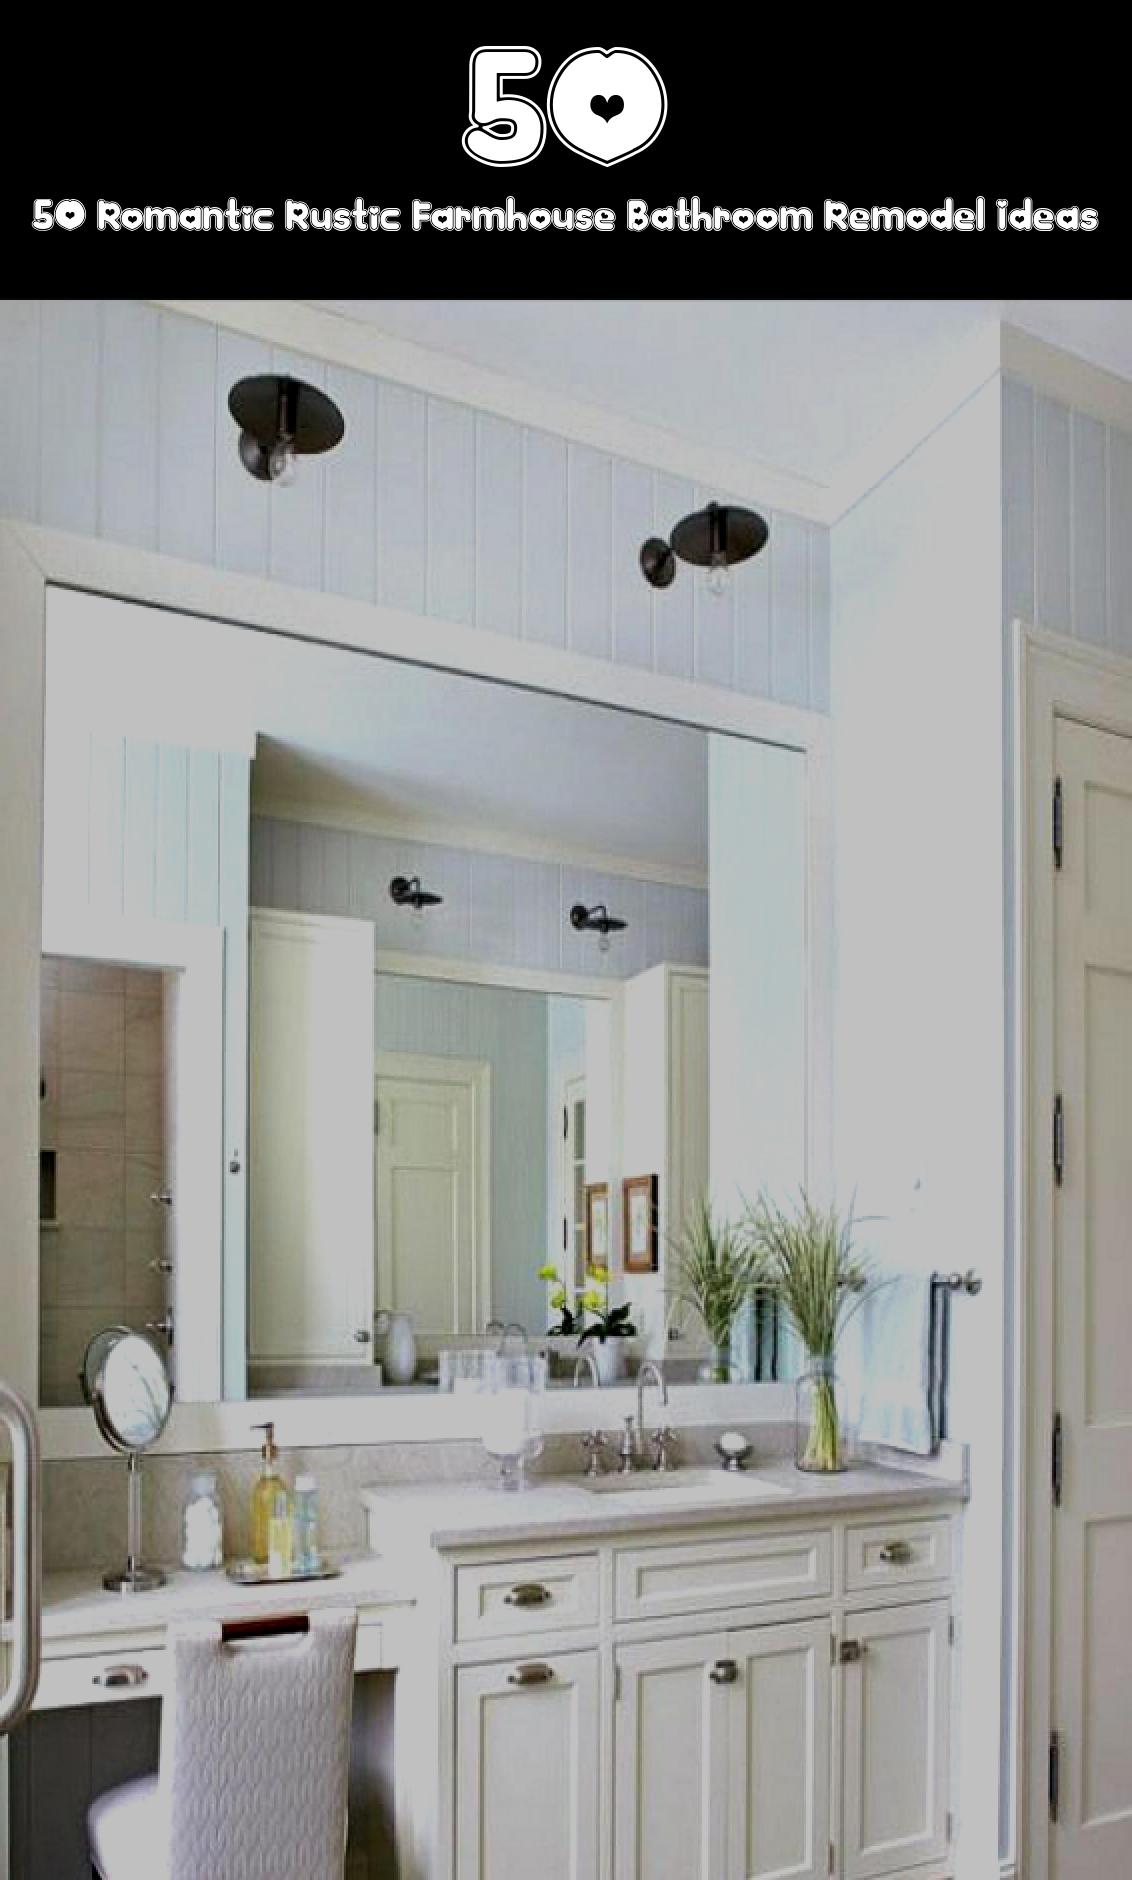 Photo of 50 Romantic Rustic Farmhouse Bathroom Remodel Ideas